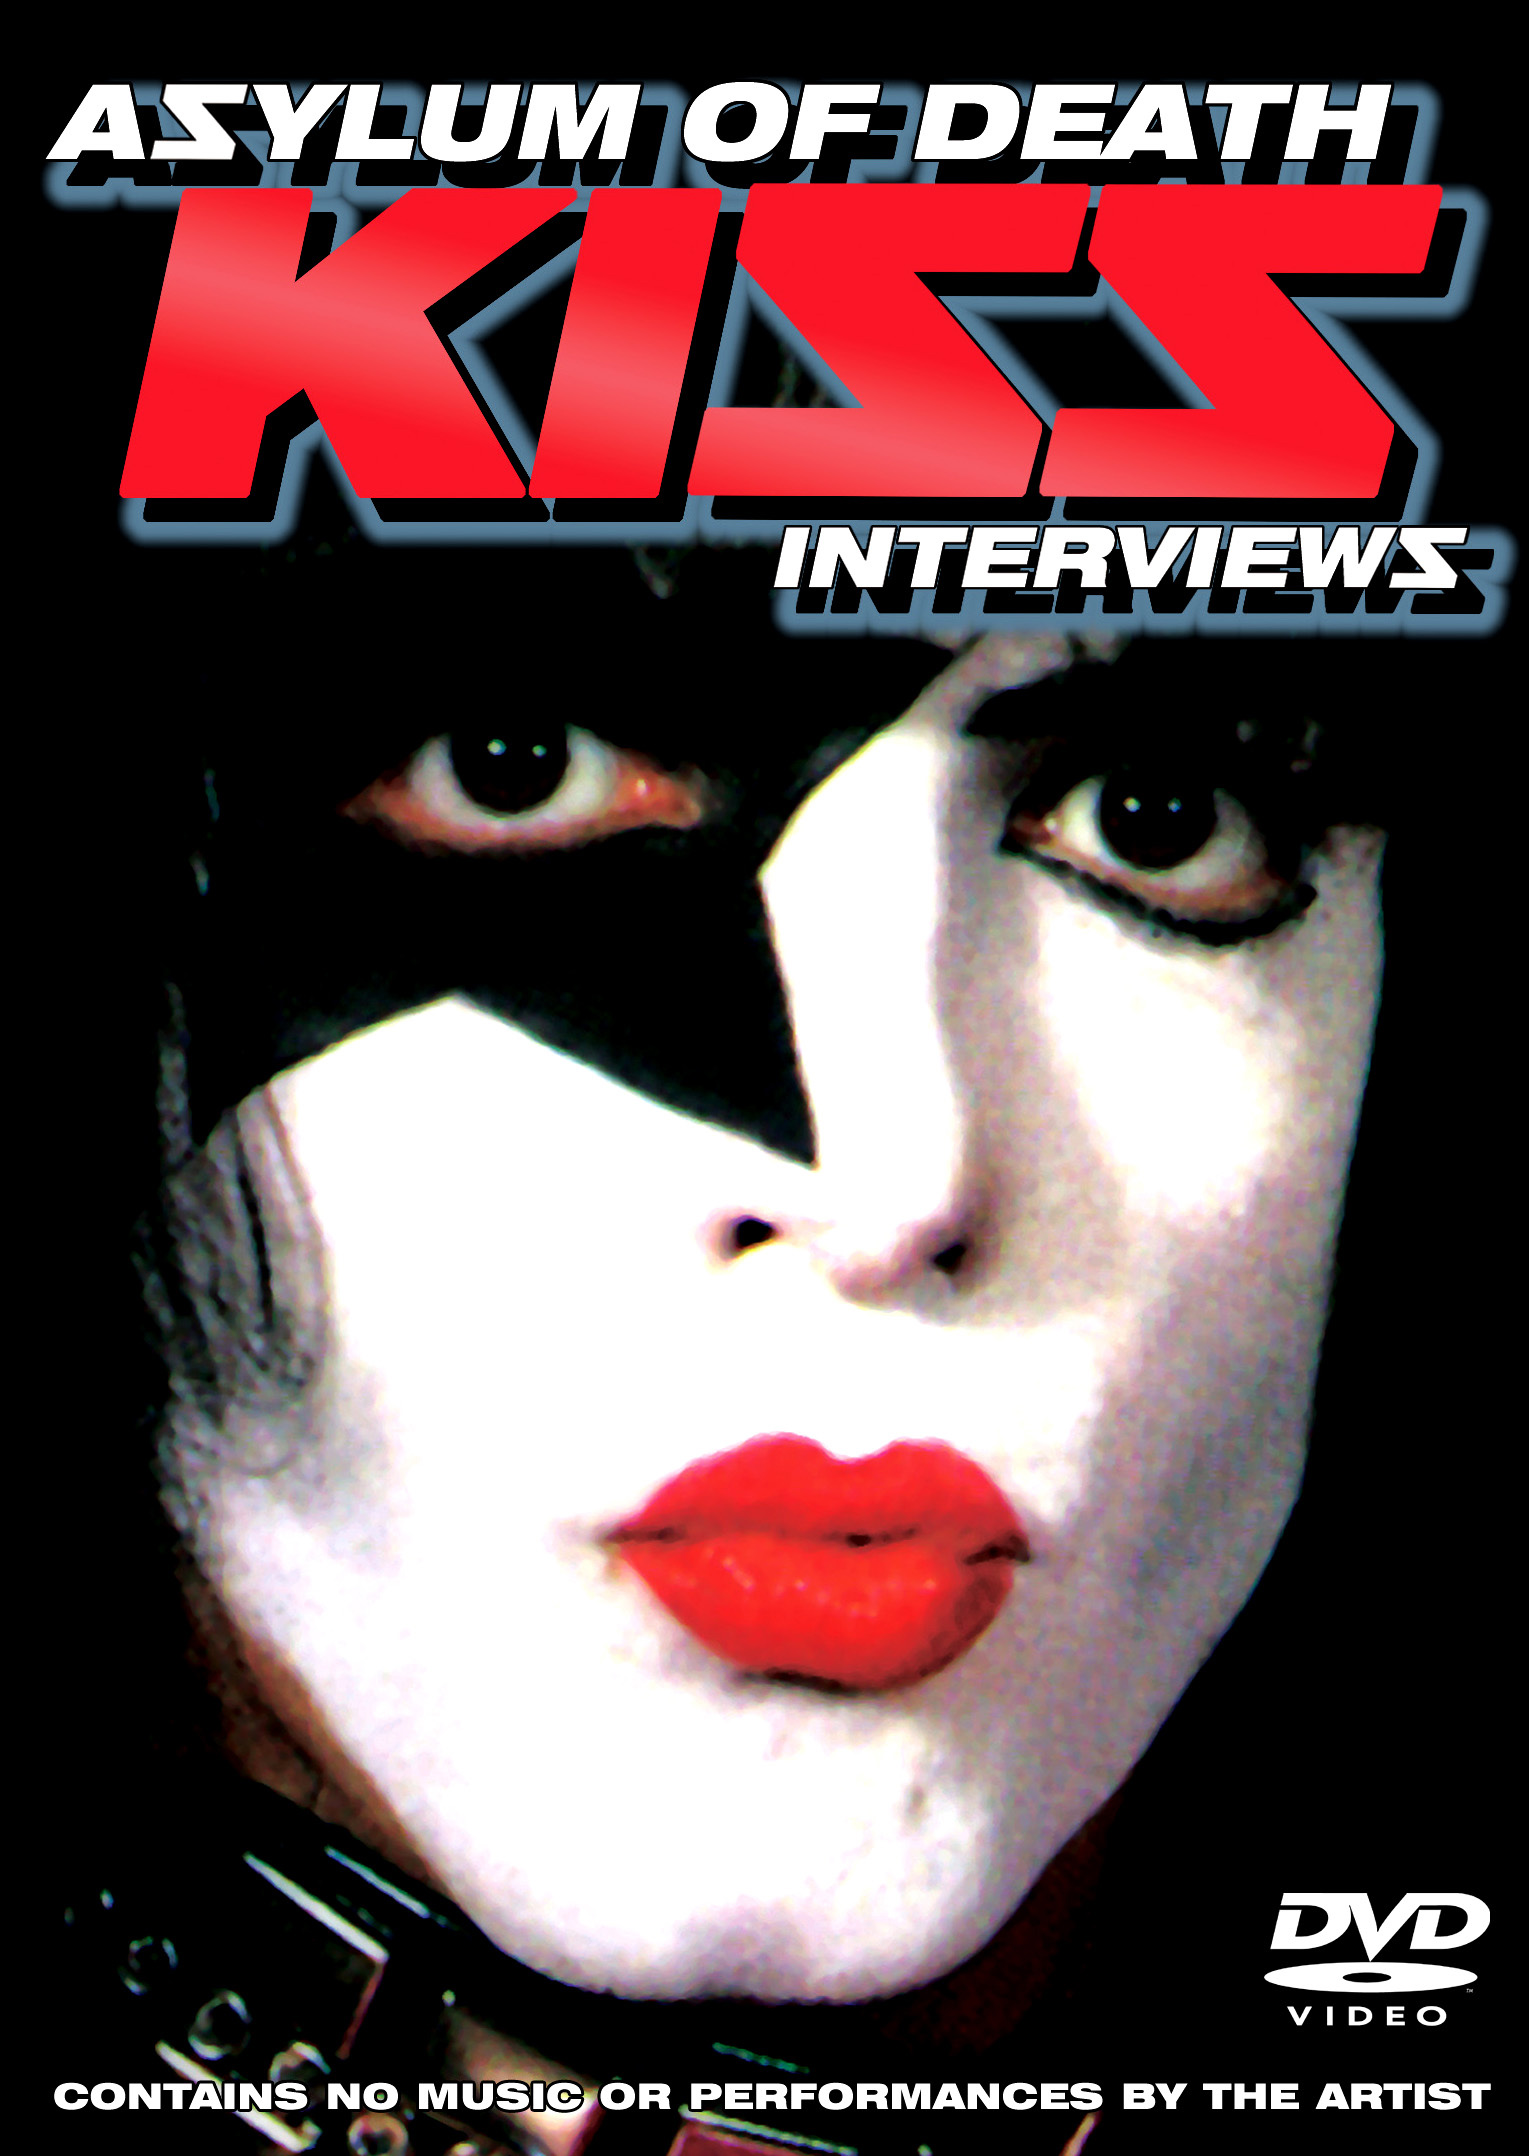 KISS: Asylum of Death - Interviews